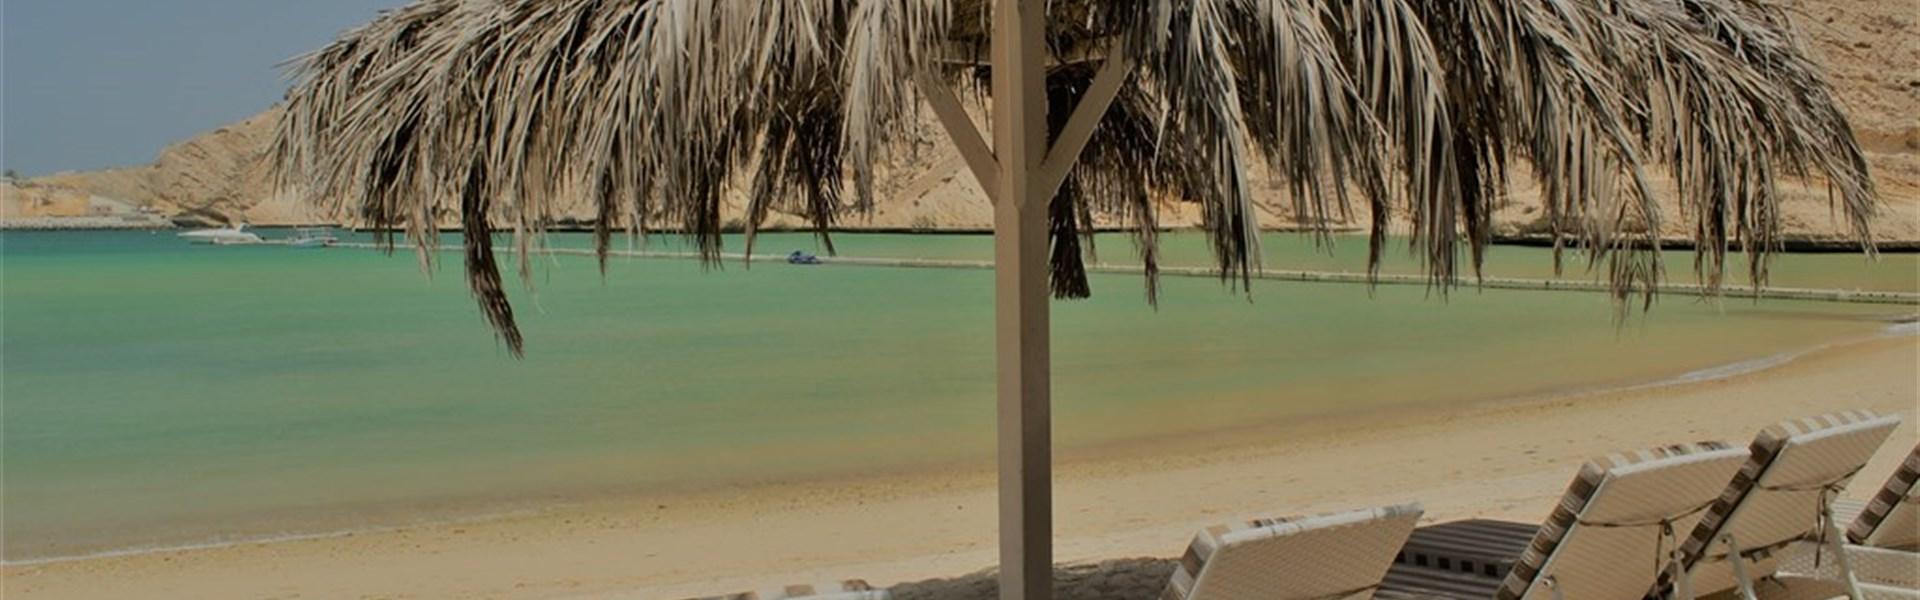 Pobyt u moře - Muscat Hills Resort